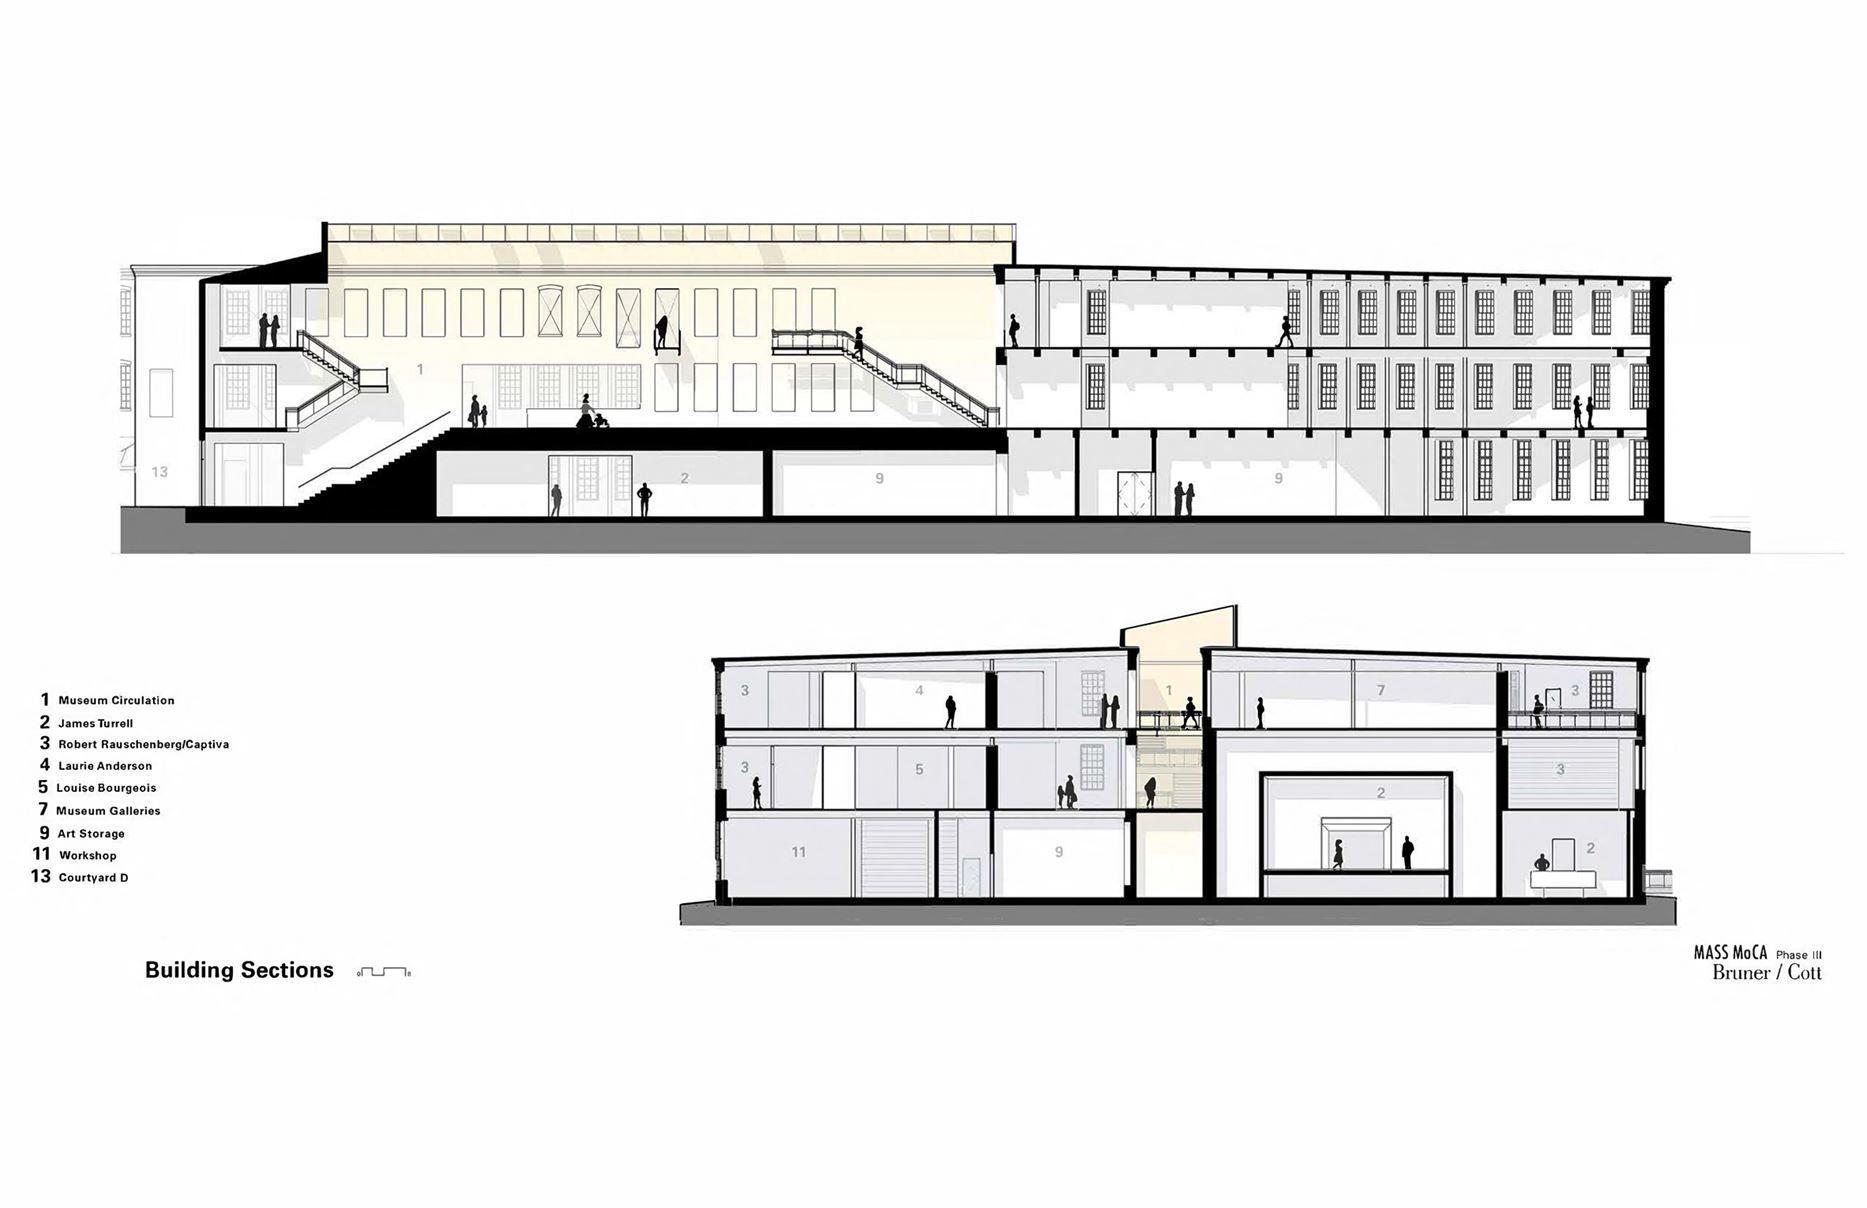 floor-plan-bruner-cott-mass-moca-massachusetts-museum-of-contemporary-art-museum-textile-factory-berkshires6-expansion-renovation_de